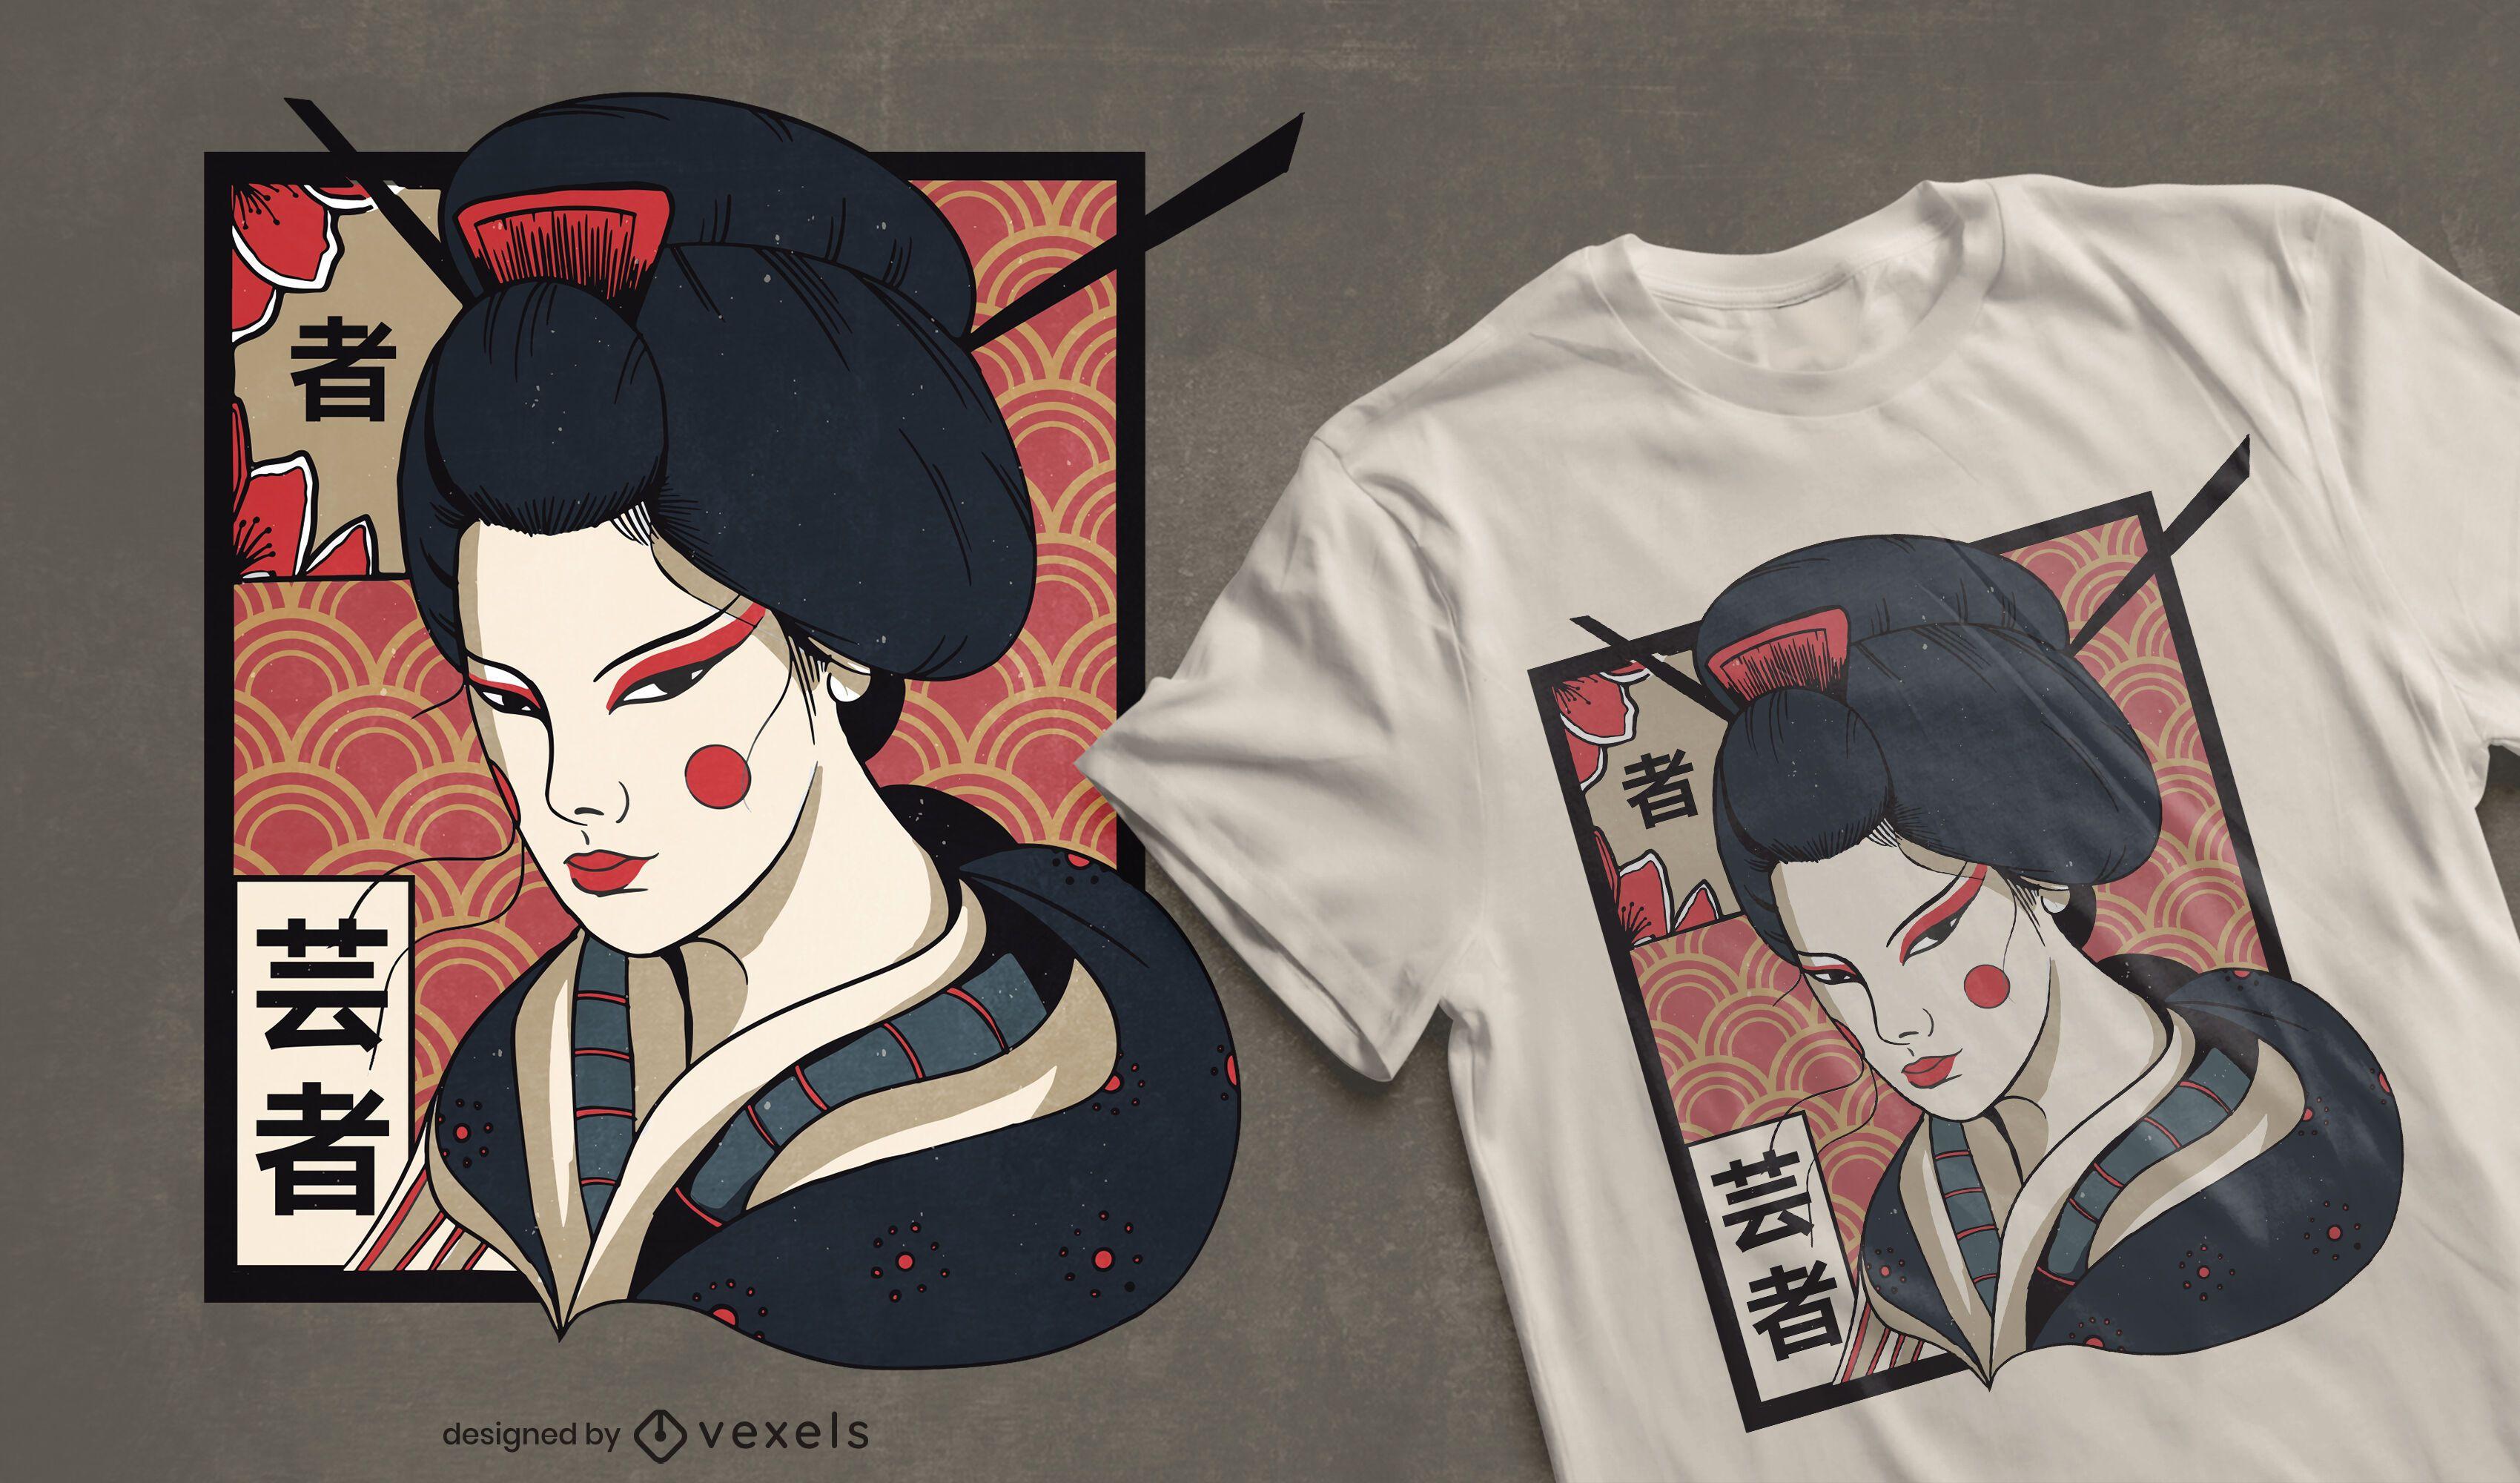 Dise?o de camiseta de geisha tradicional.